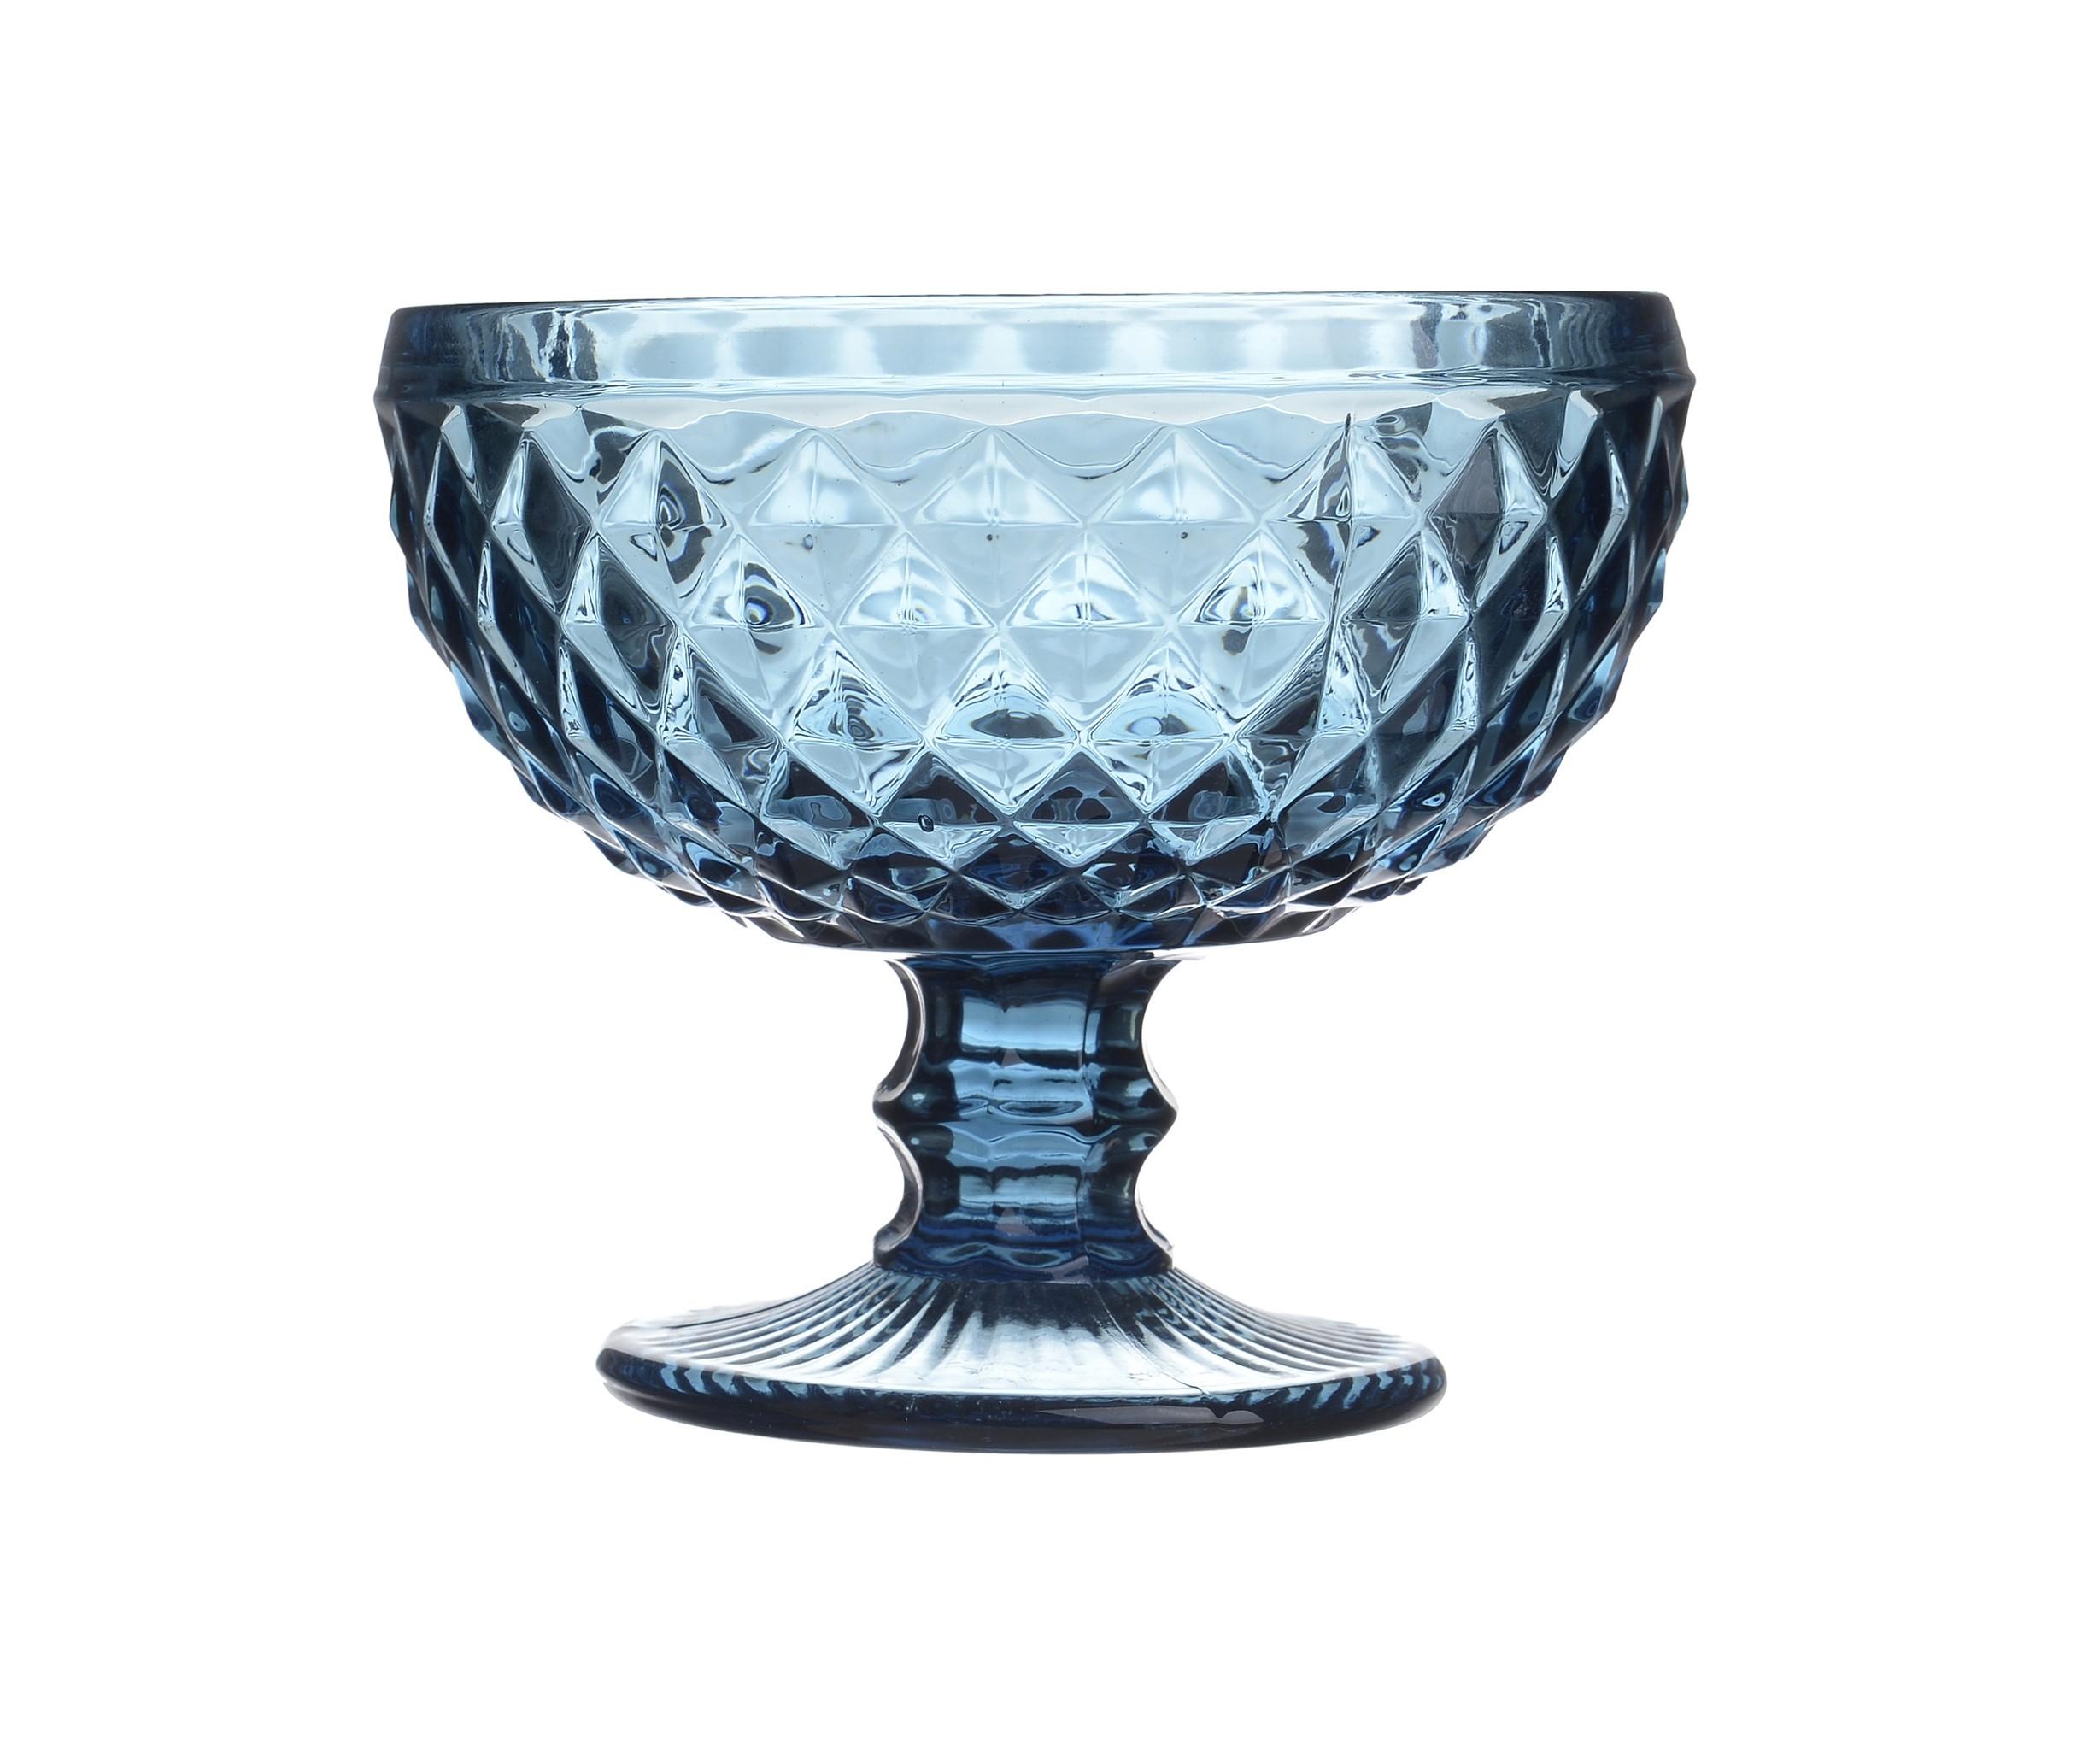 Набор ваз Idouma (4шт)Миски и чаши<br><br><br>Material: Стекло<br>Ширина см: 10<br>Высота см: 8<br>Глубина см: 12